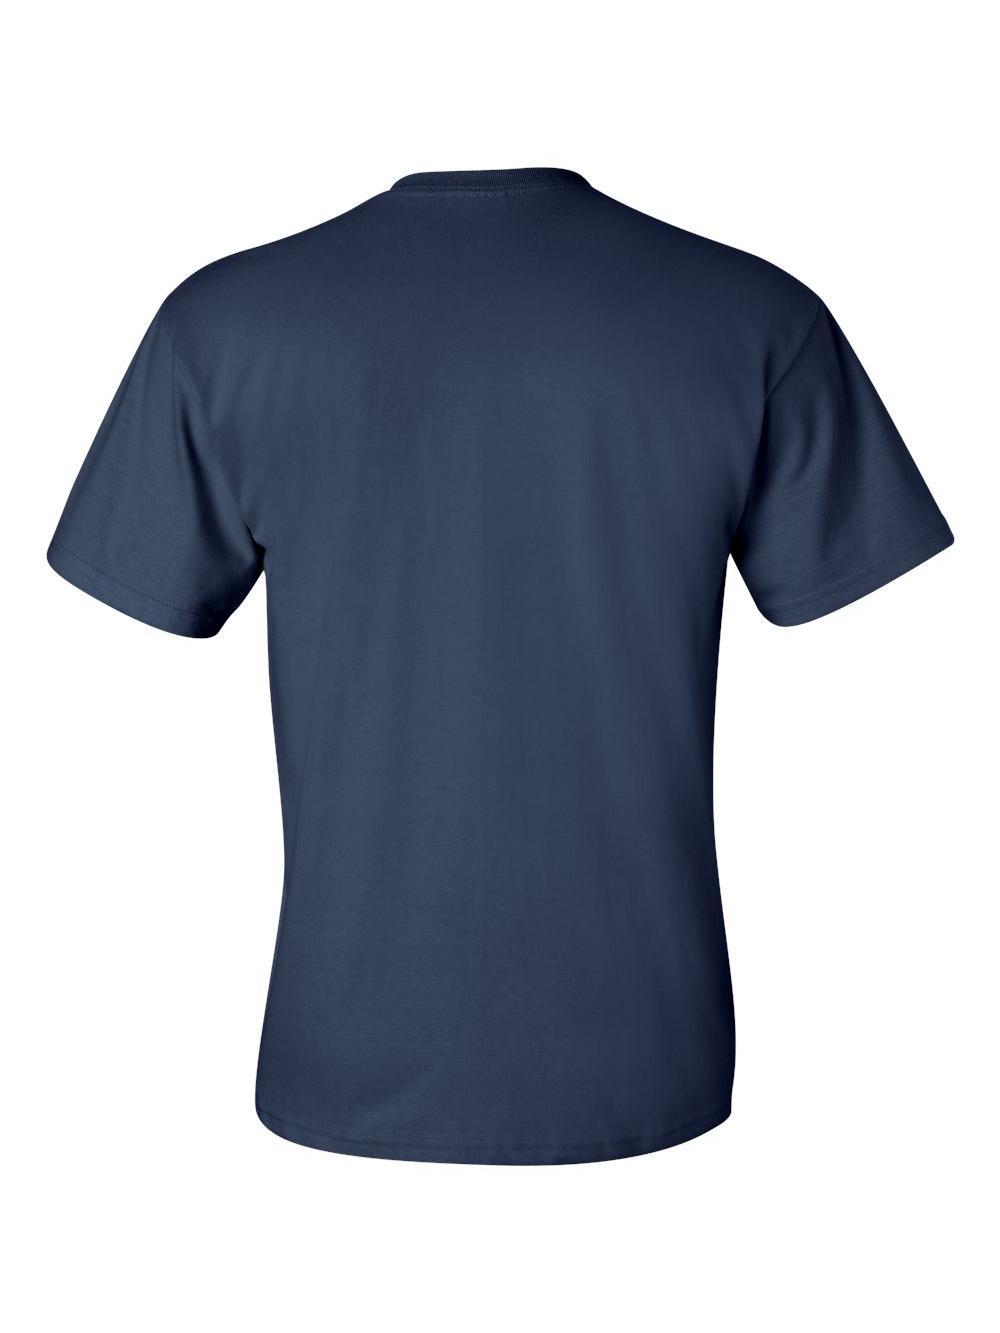 Gildan-Ultra-Cotton-T-Shirt-with-a-Pocket-2300 thumbnail 22